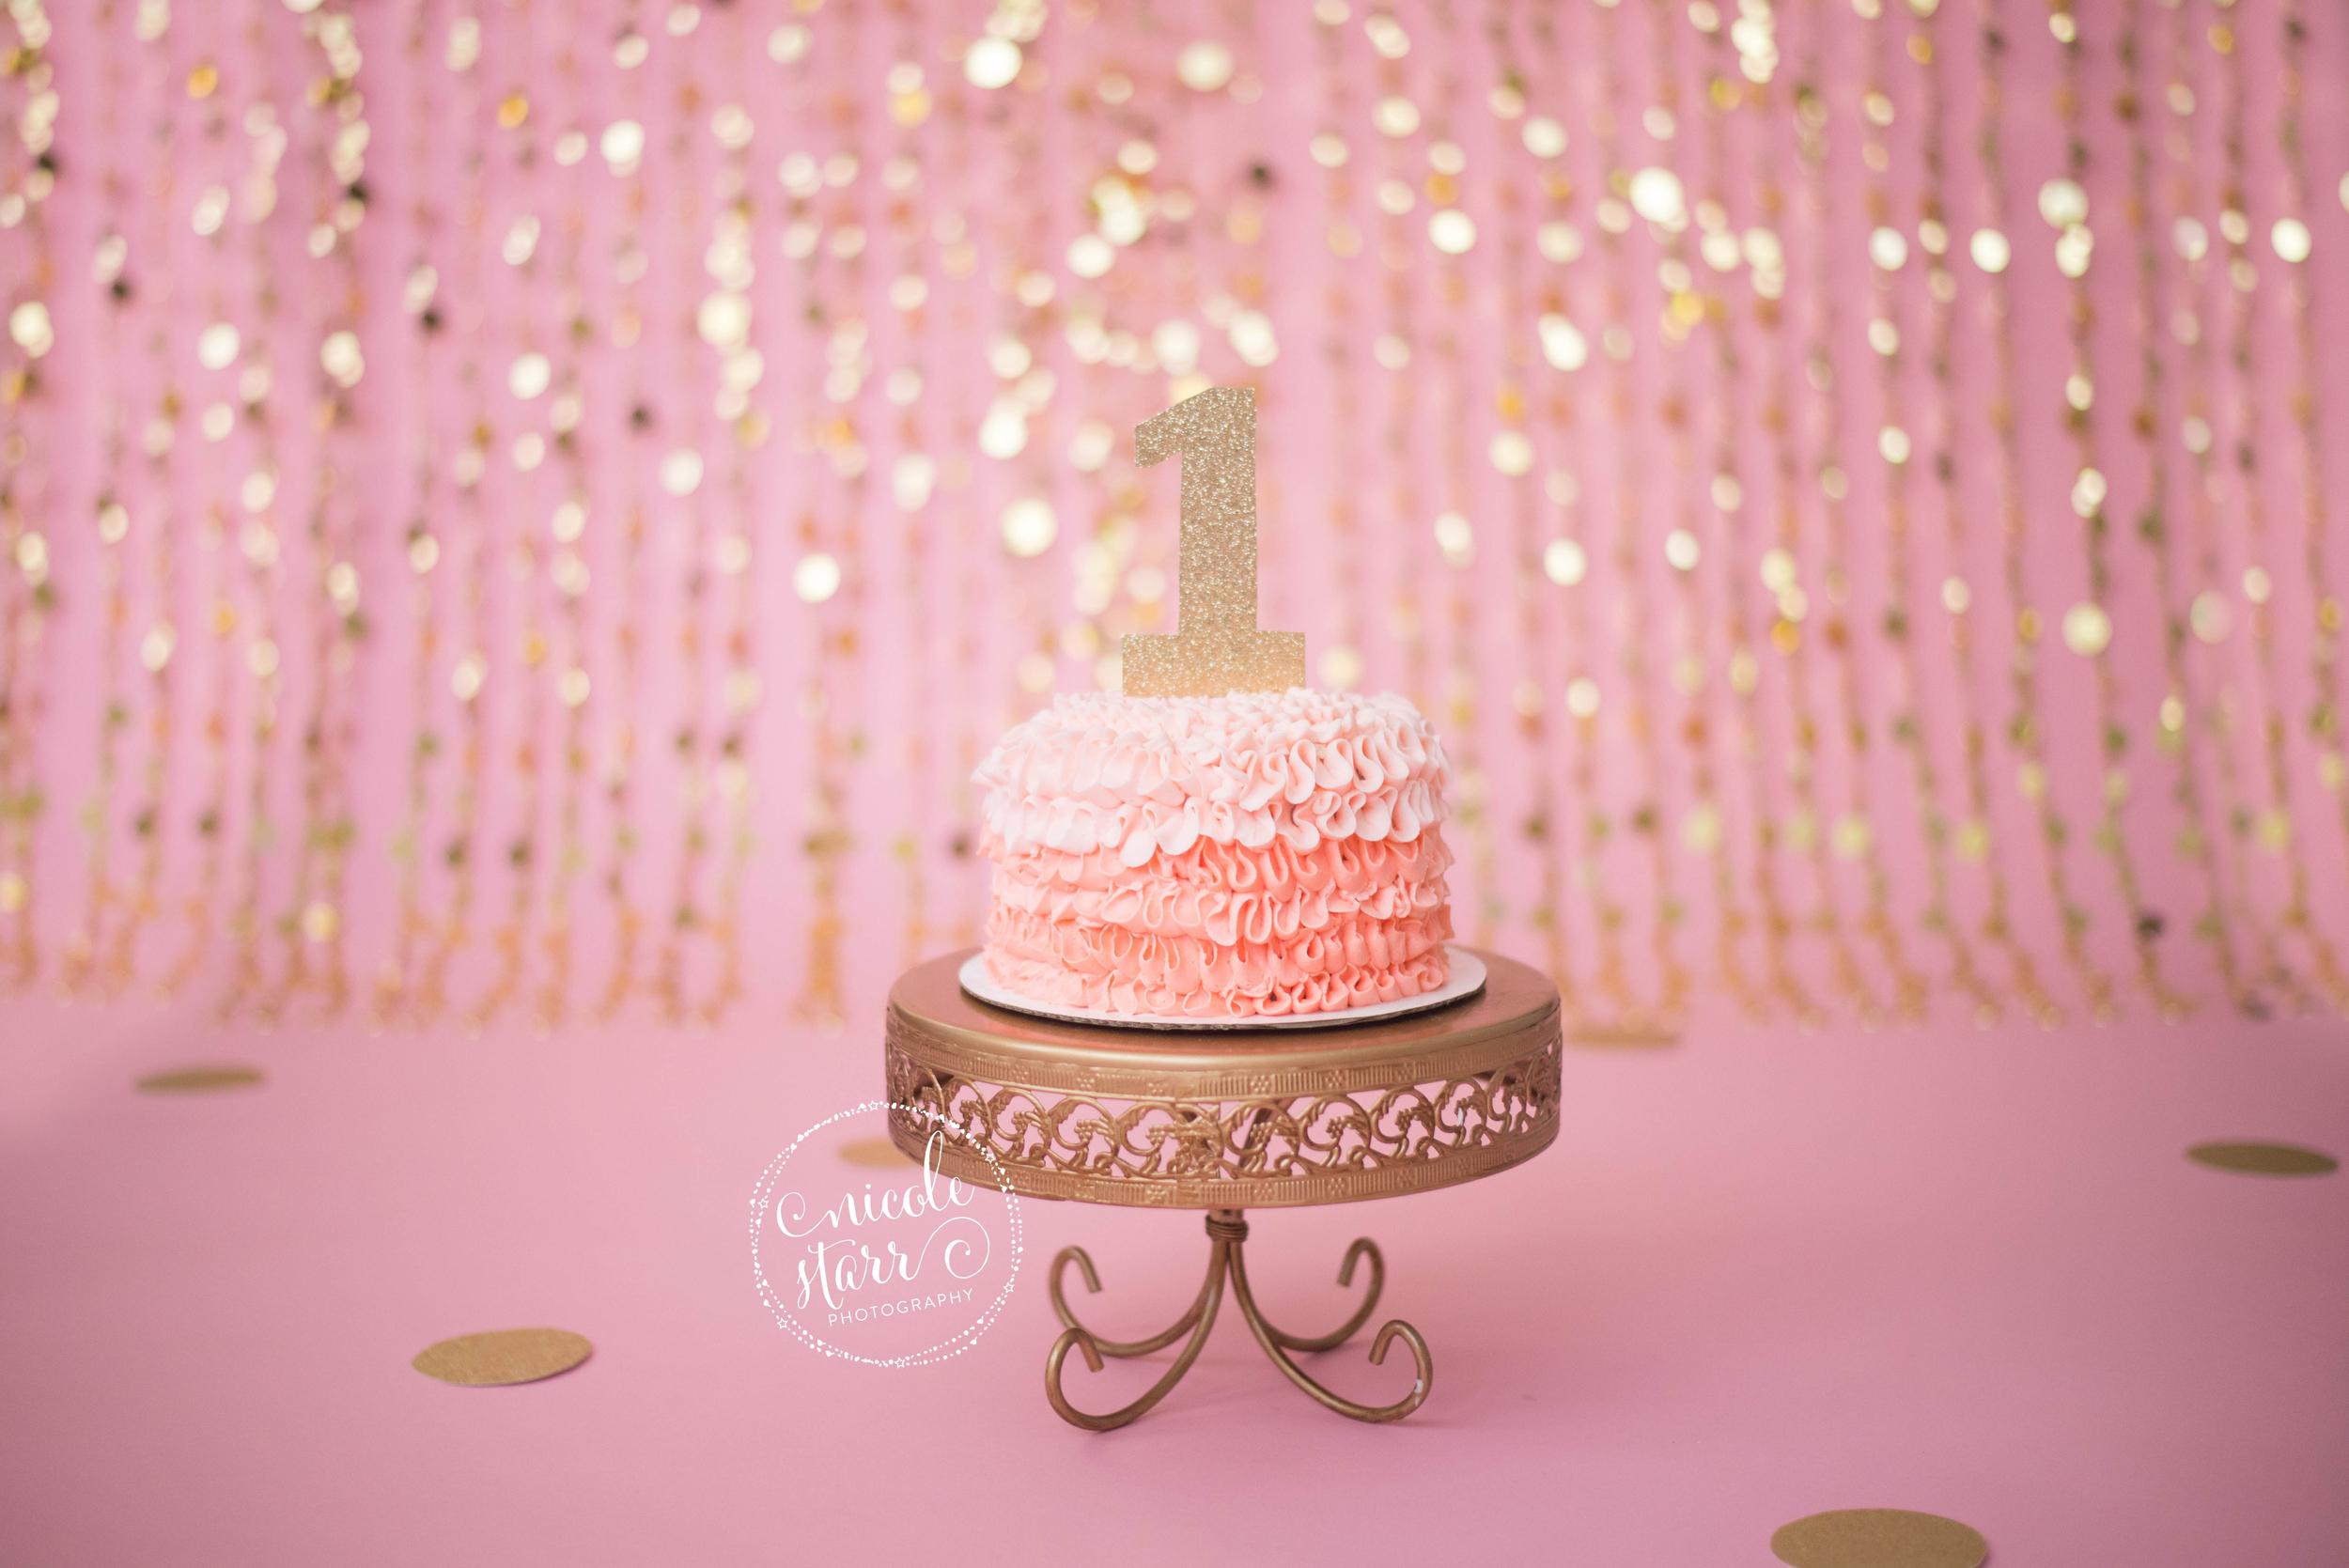 WM pink gold birthday cake smash set up